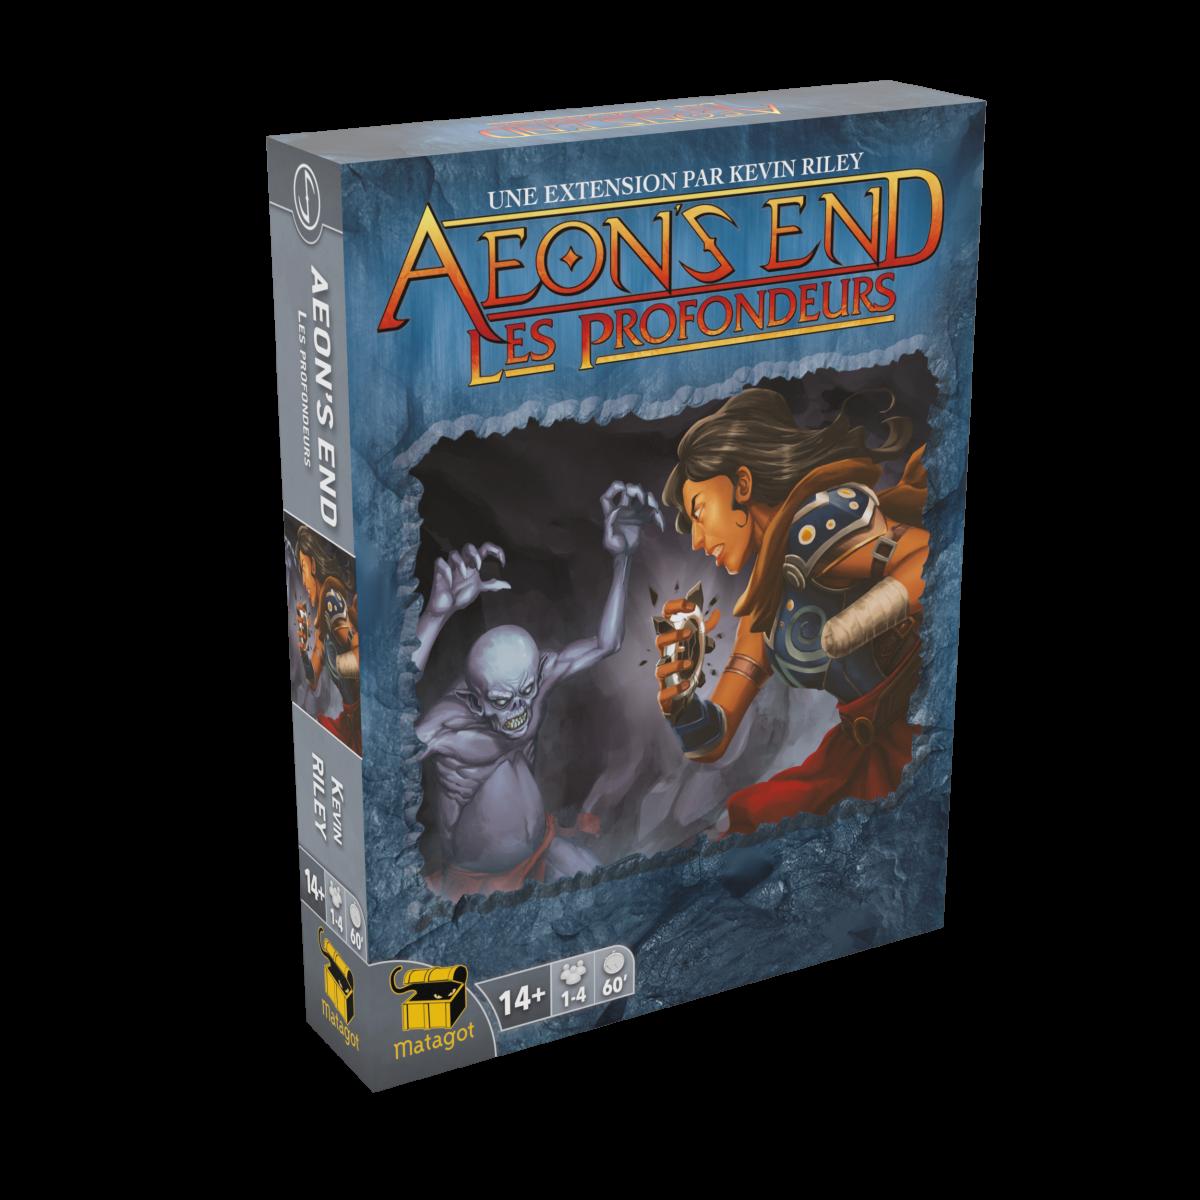 Aeon's End Les Profondeur